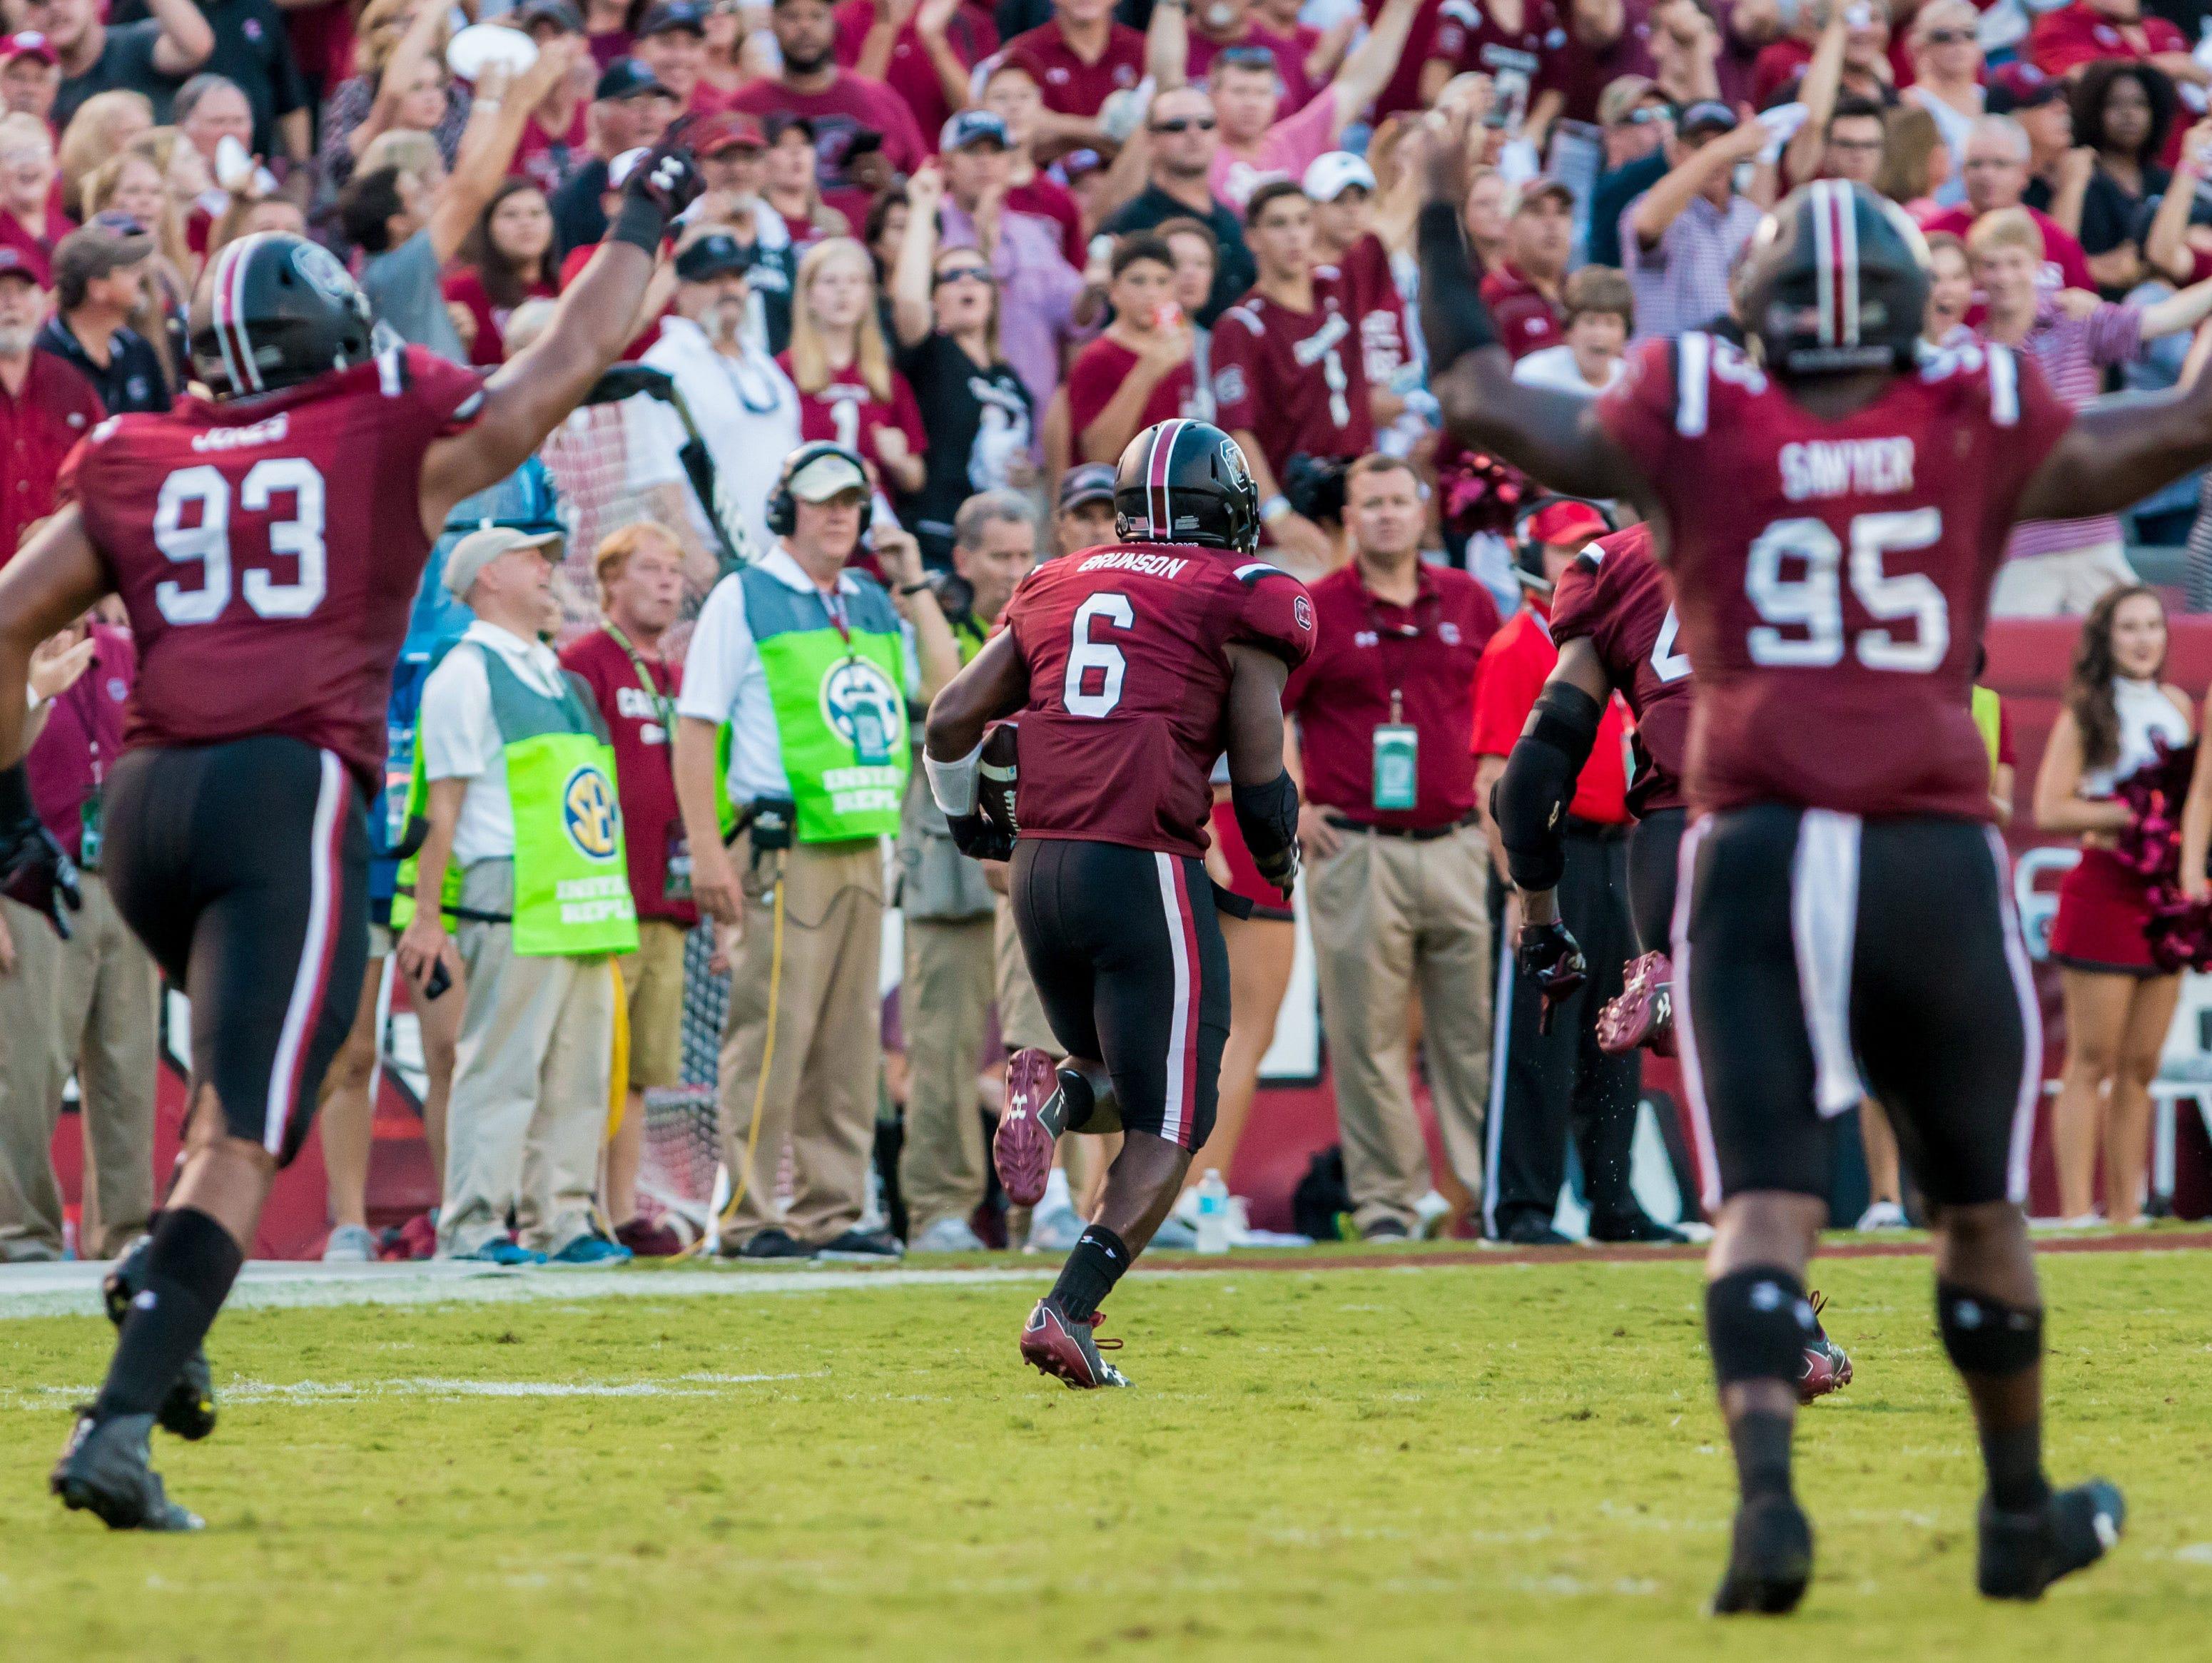 South Carolina Gamecocks linebacker T.J. Brunson (6) returns a fumble for a touchdown against the Arkansas Razorbacks in the second half at Williams-Brice Stadium.